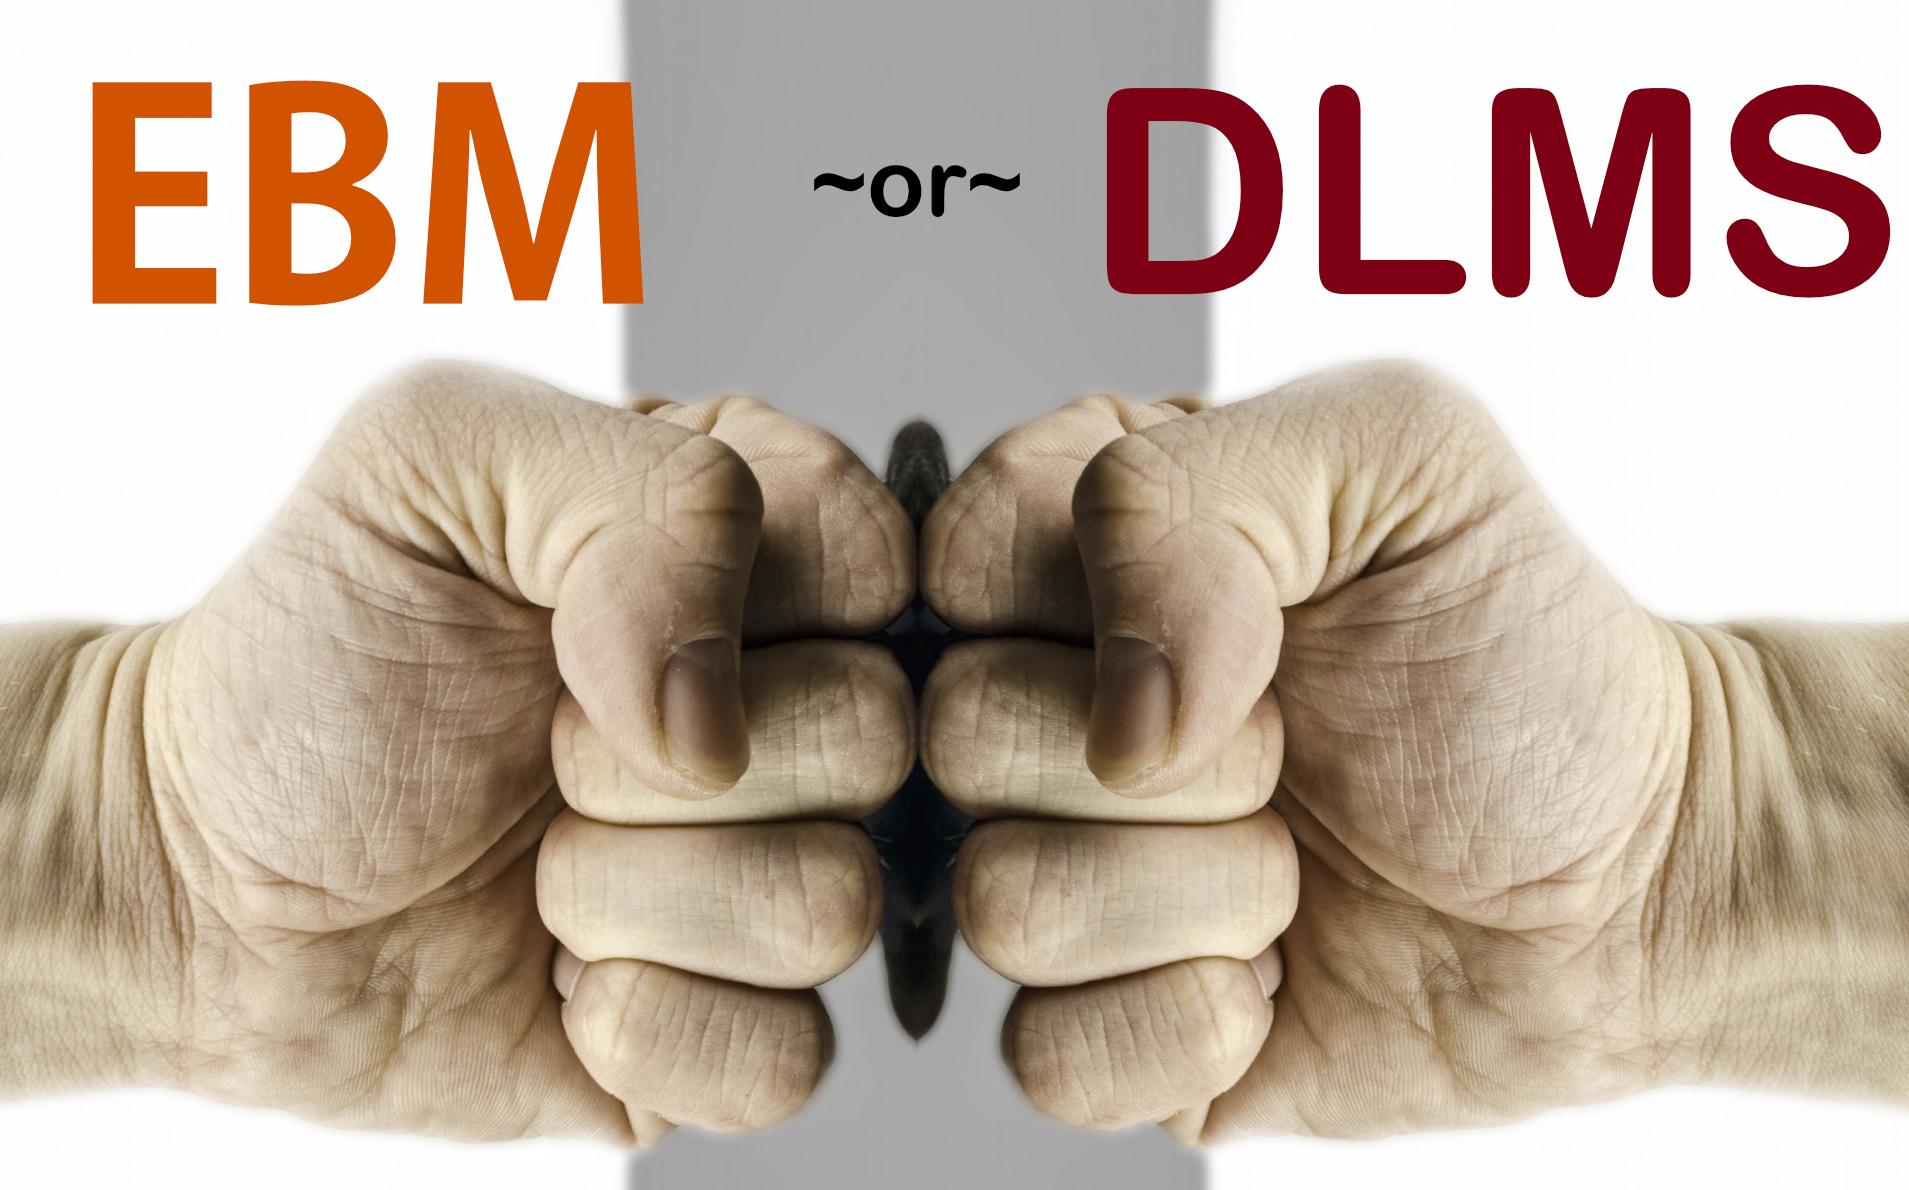 EBM or DLMS metal 3D printing comparison